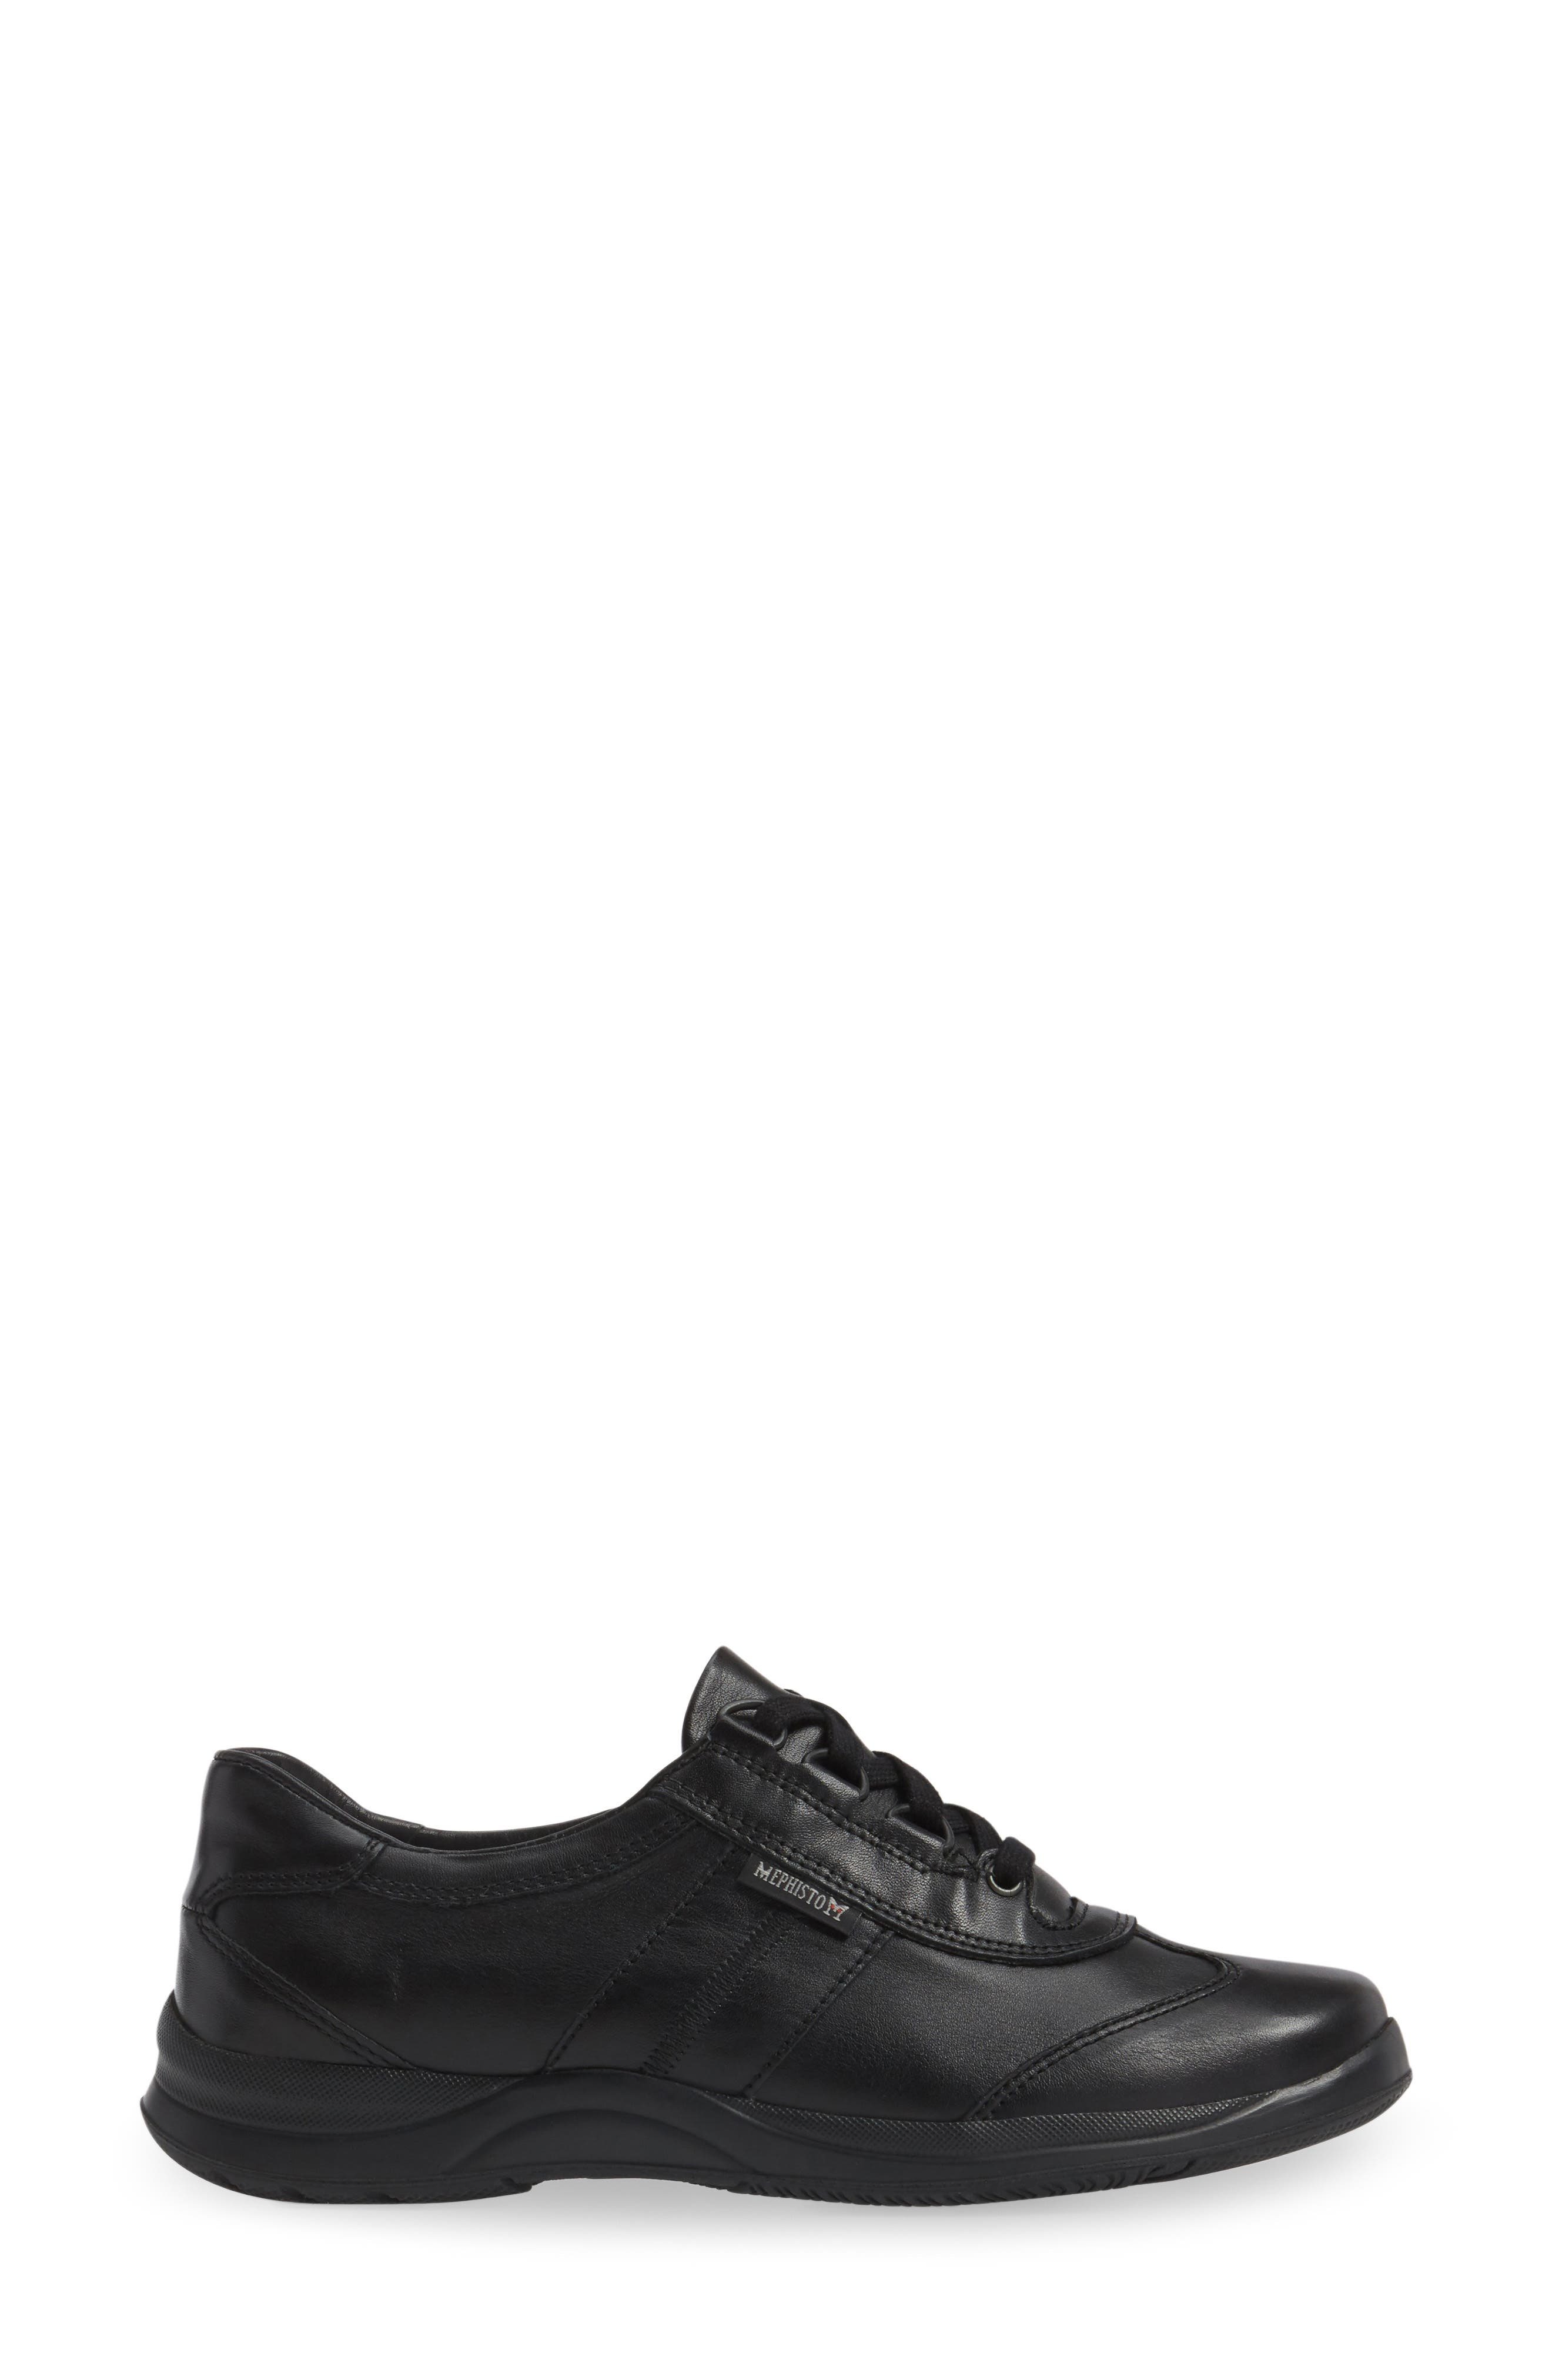 Alternate Image 3  - Mephisto 'Laser' Walking Shoe (Women)